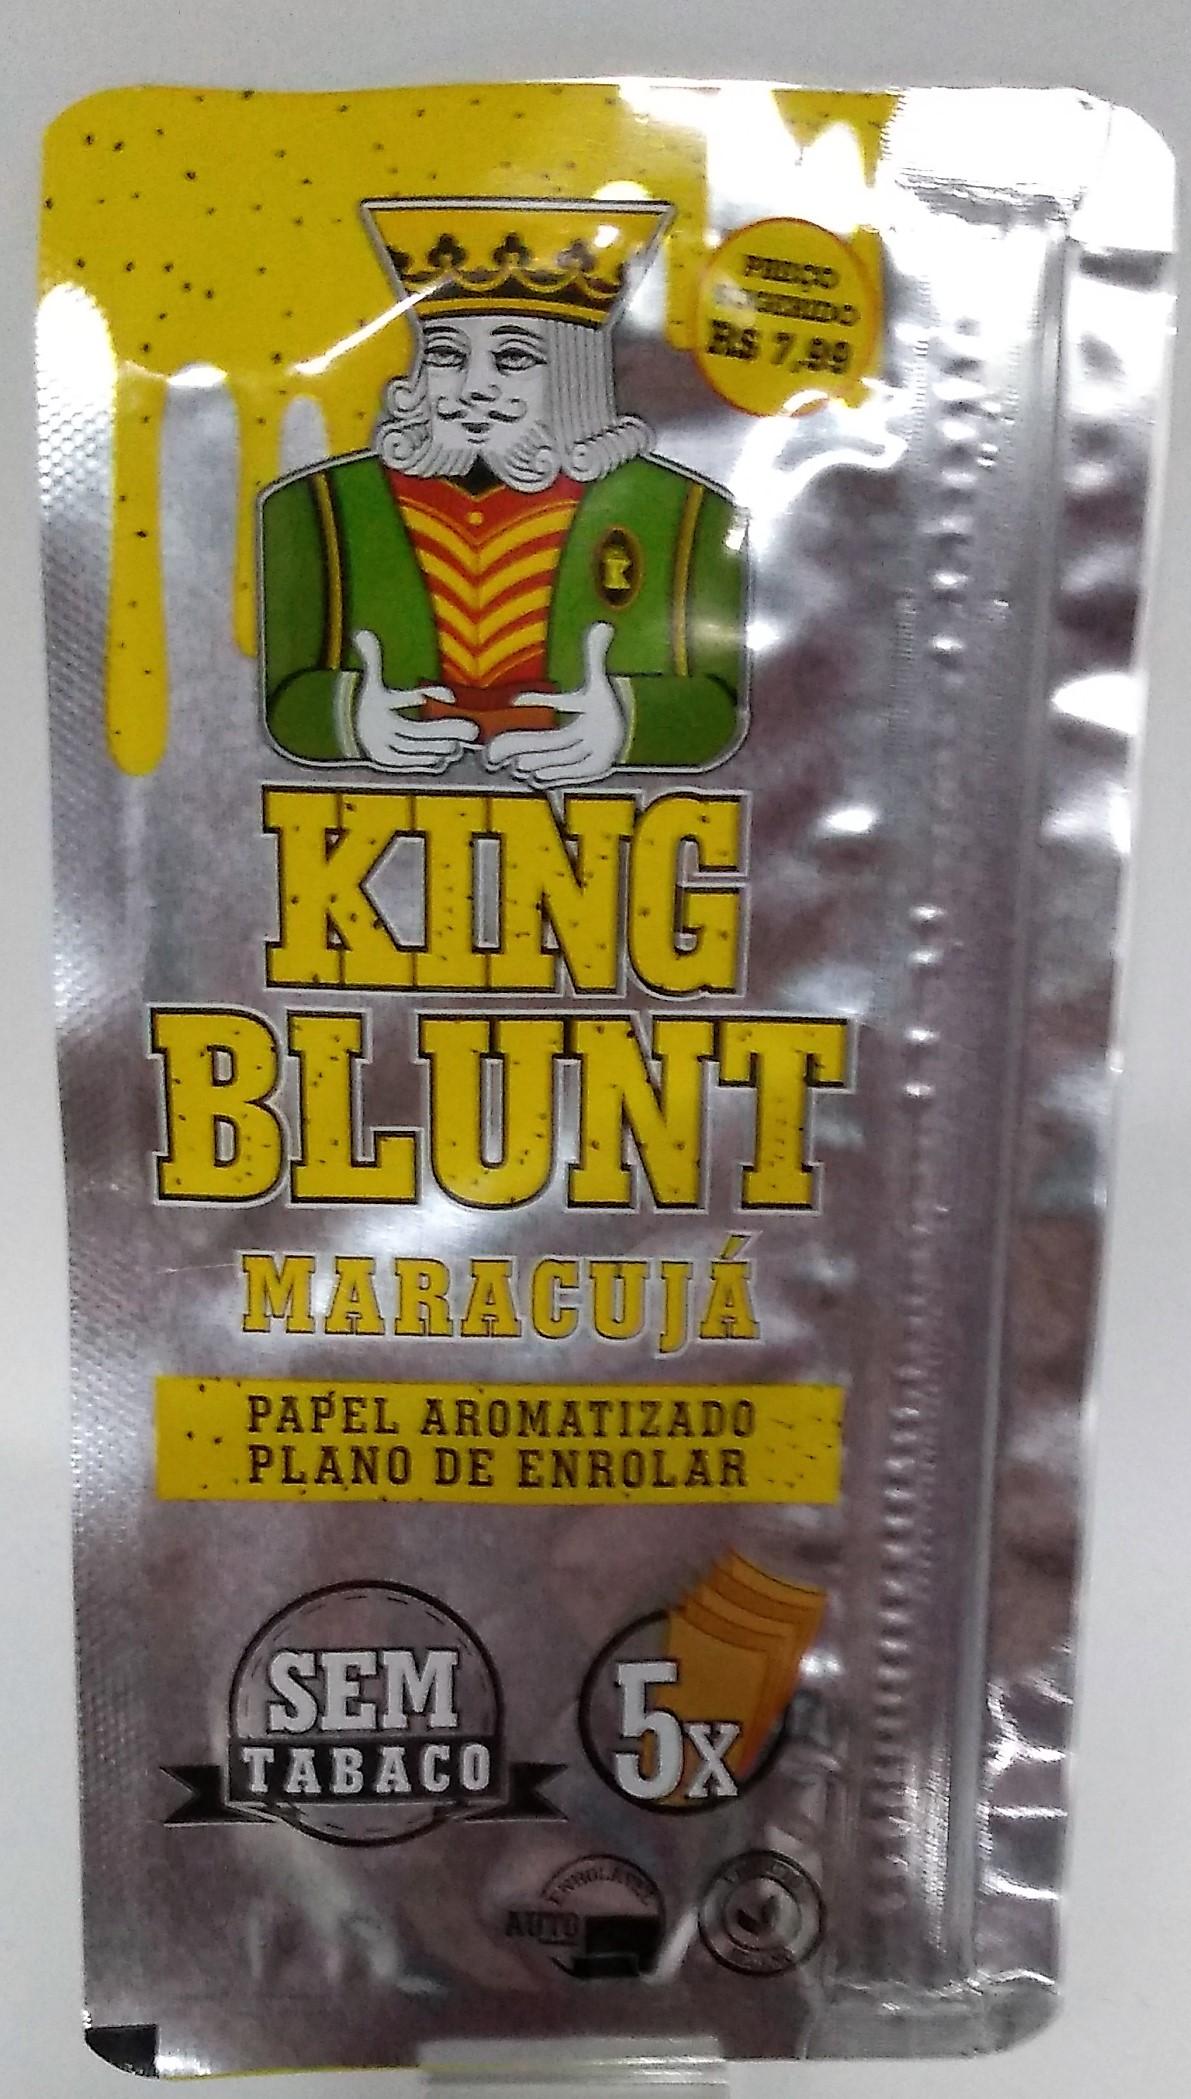 Papel Blunt King Blunt Maracujá